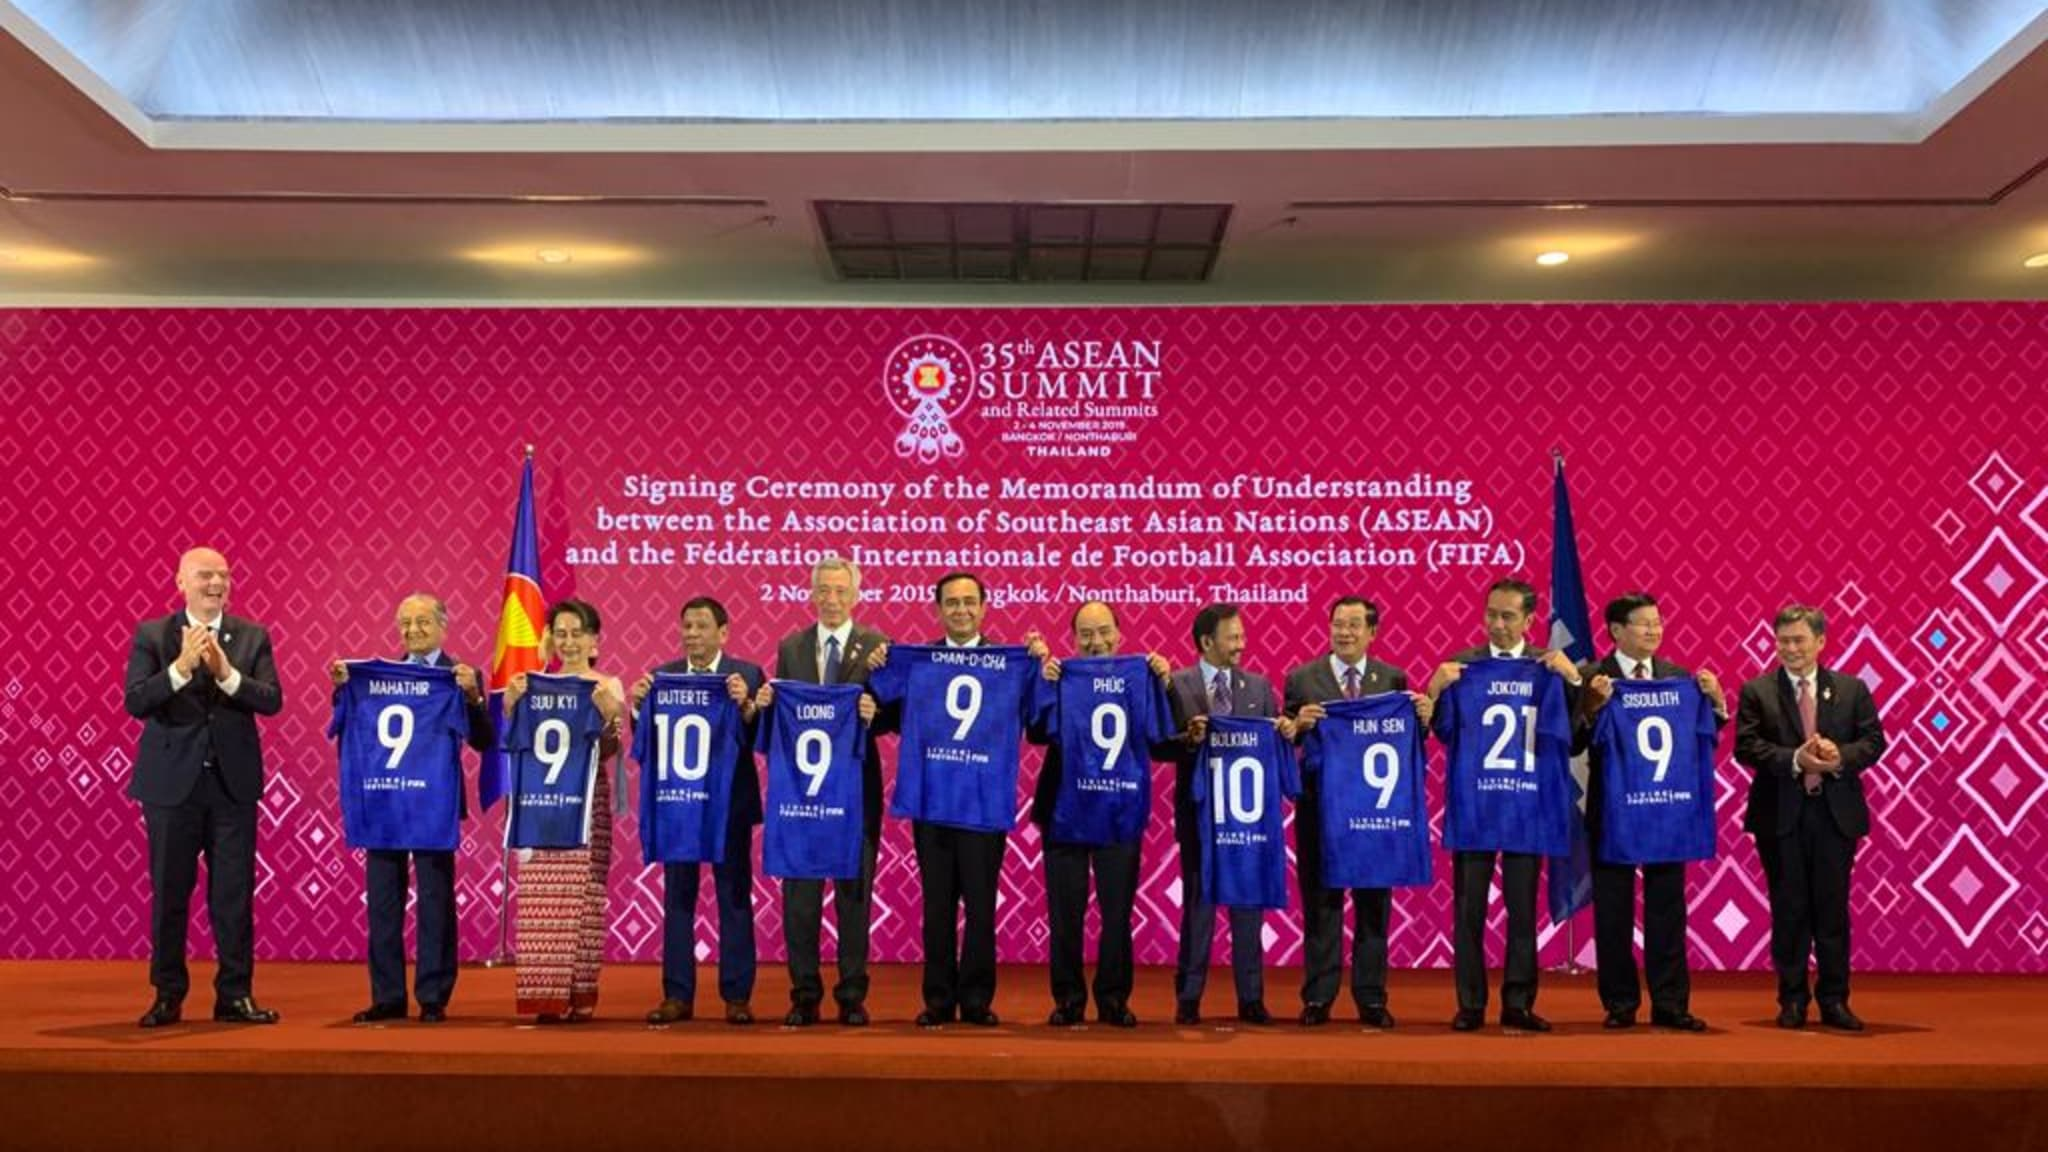 Southeast Asian leaders meet FIFA chief amid World Cup bid talks